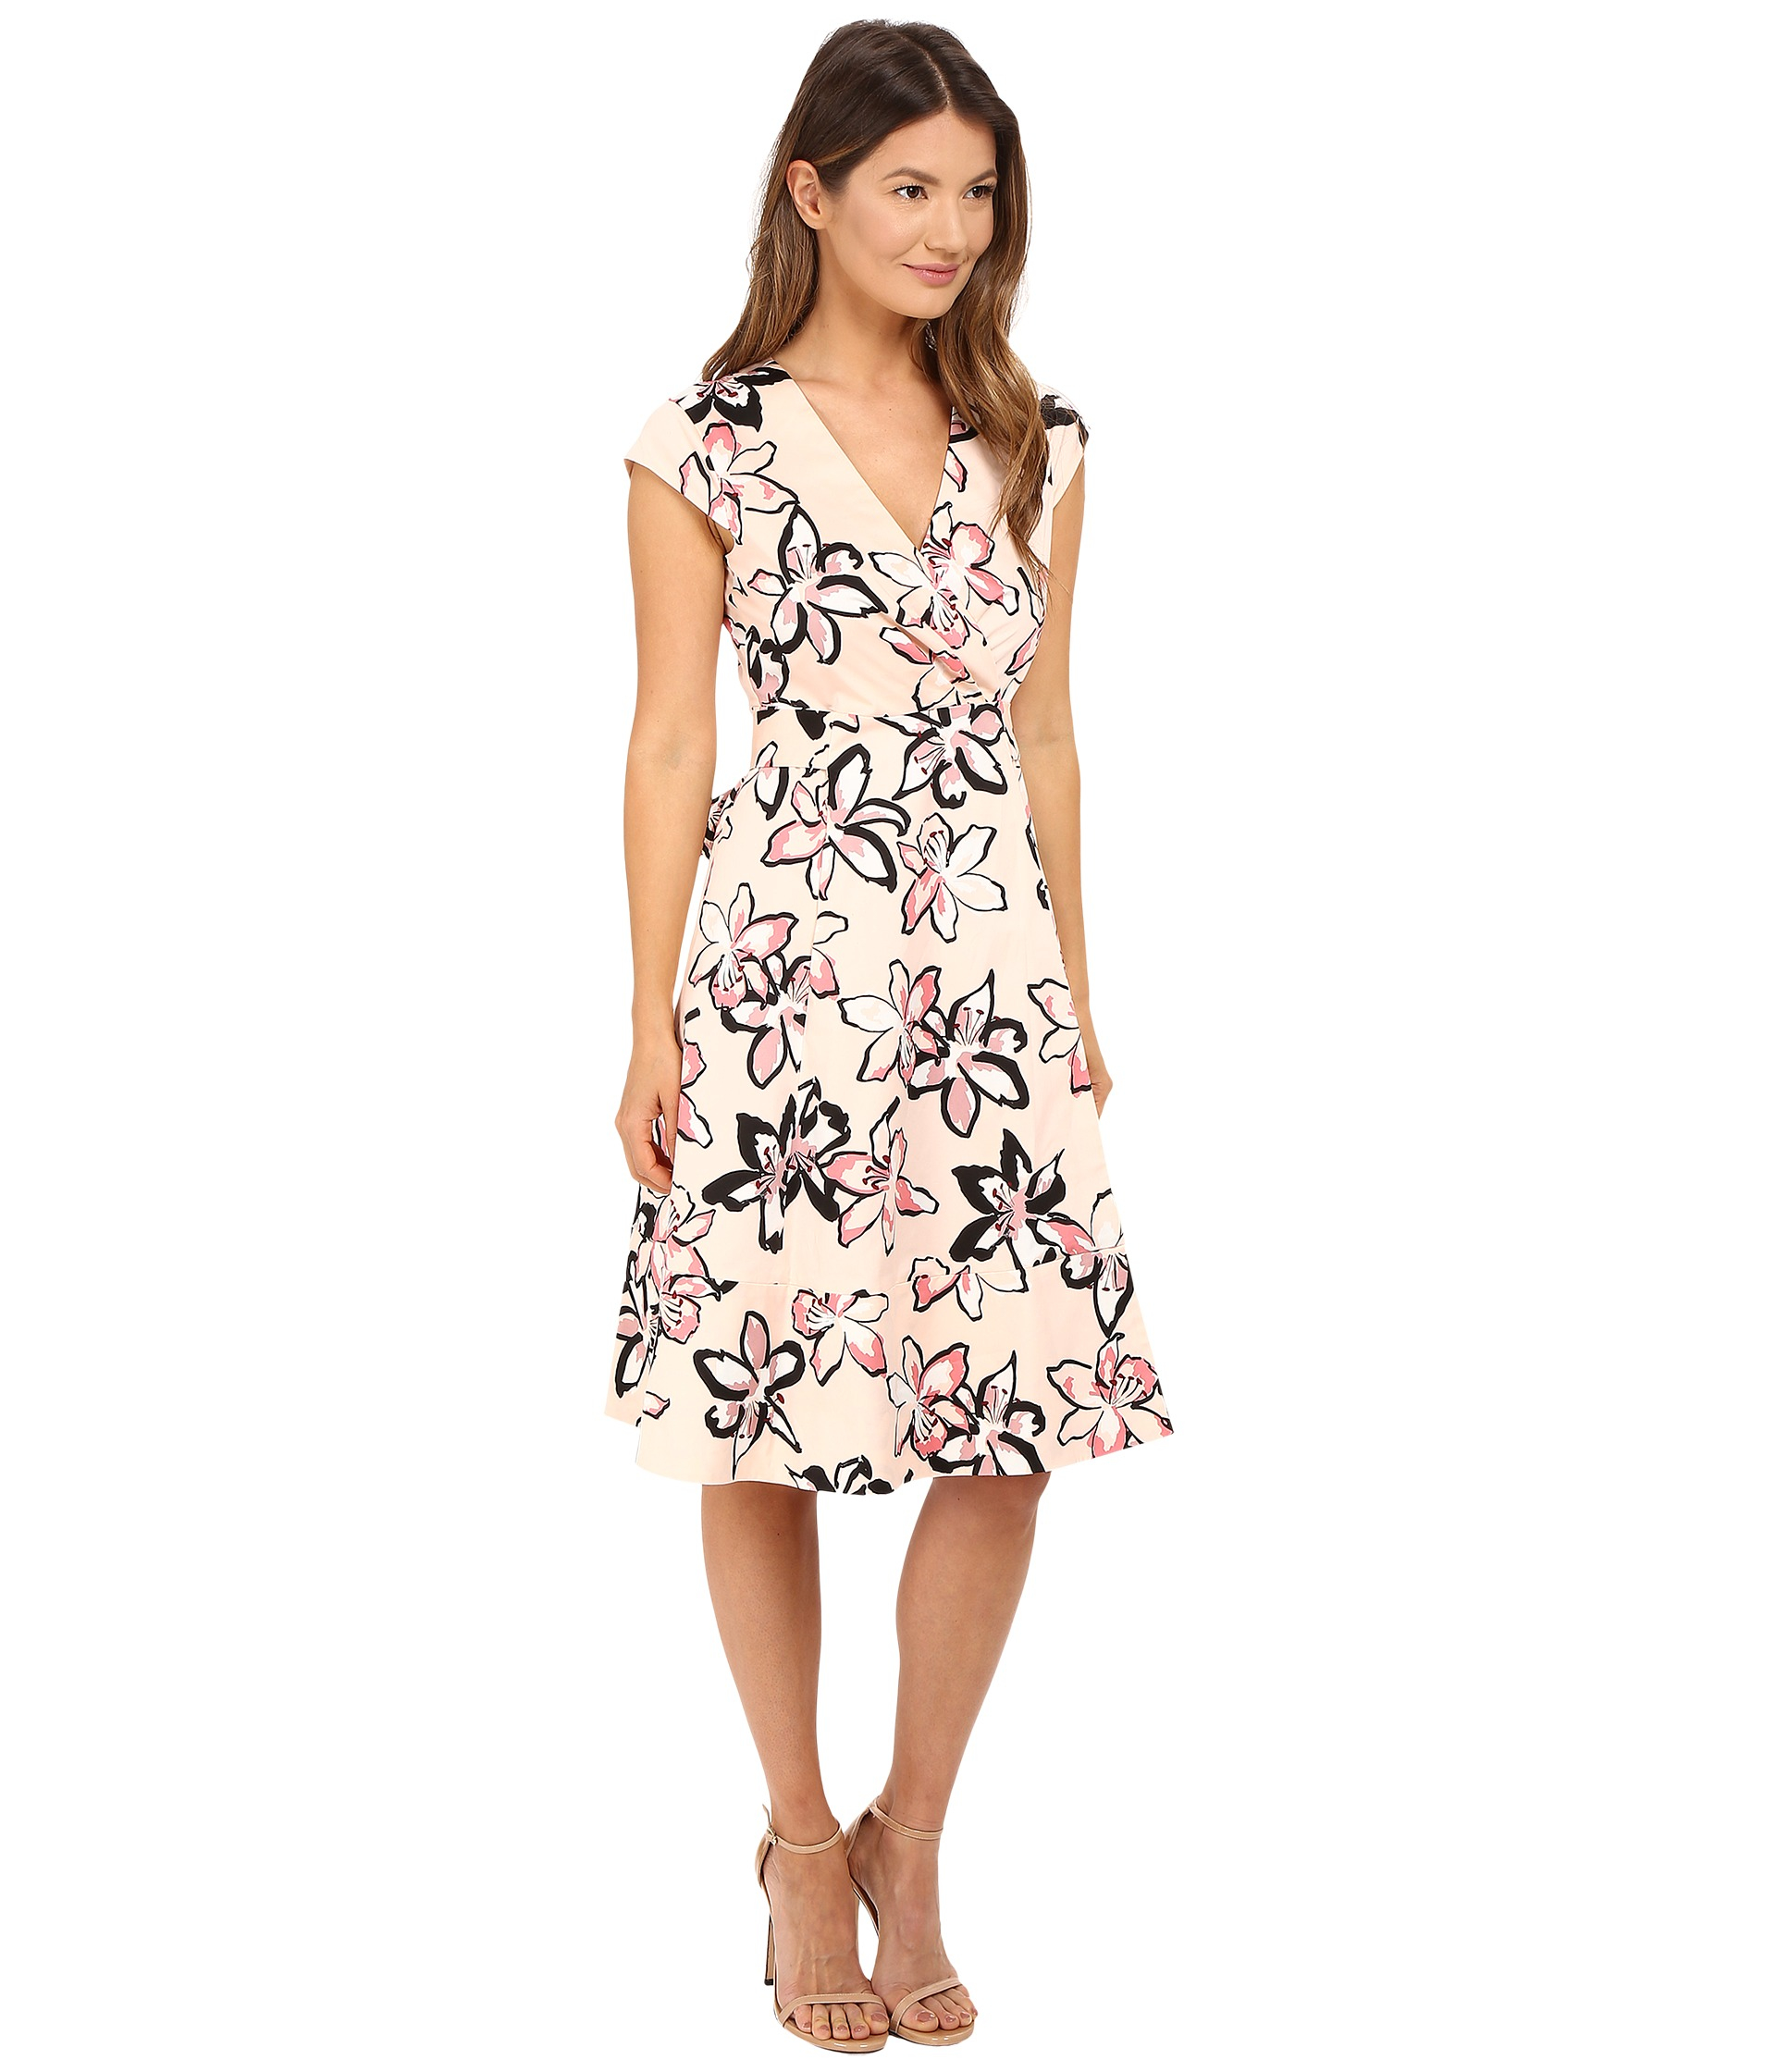 647f9ecce Lyst - Kate Spade Tiger Lily Wrap Dress